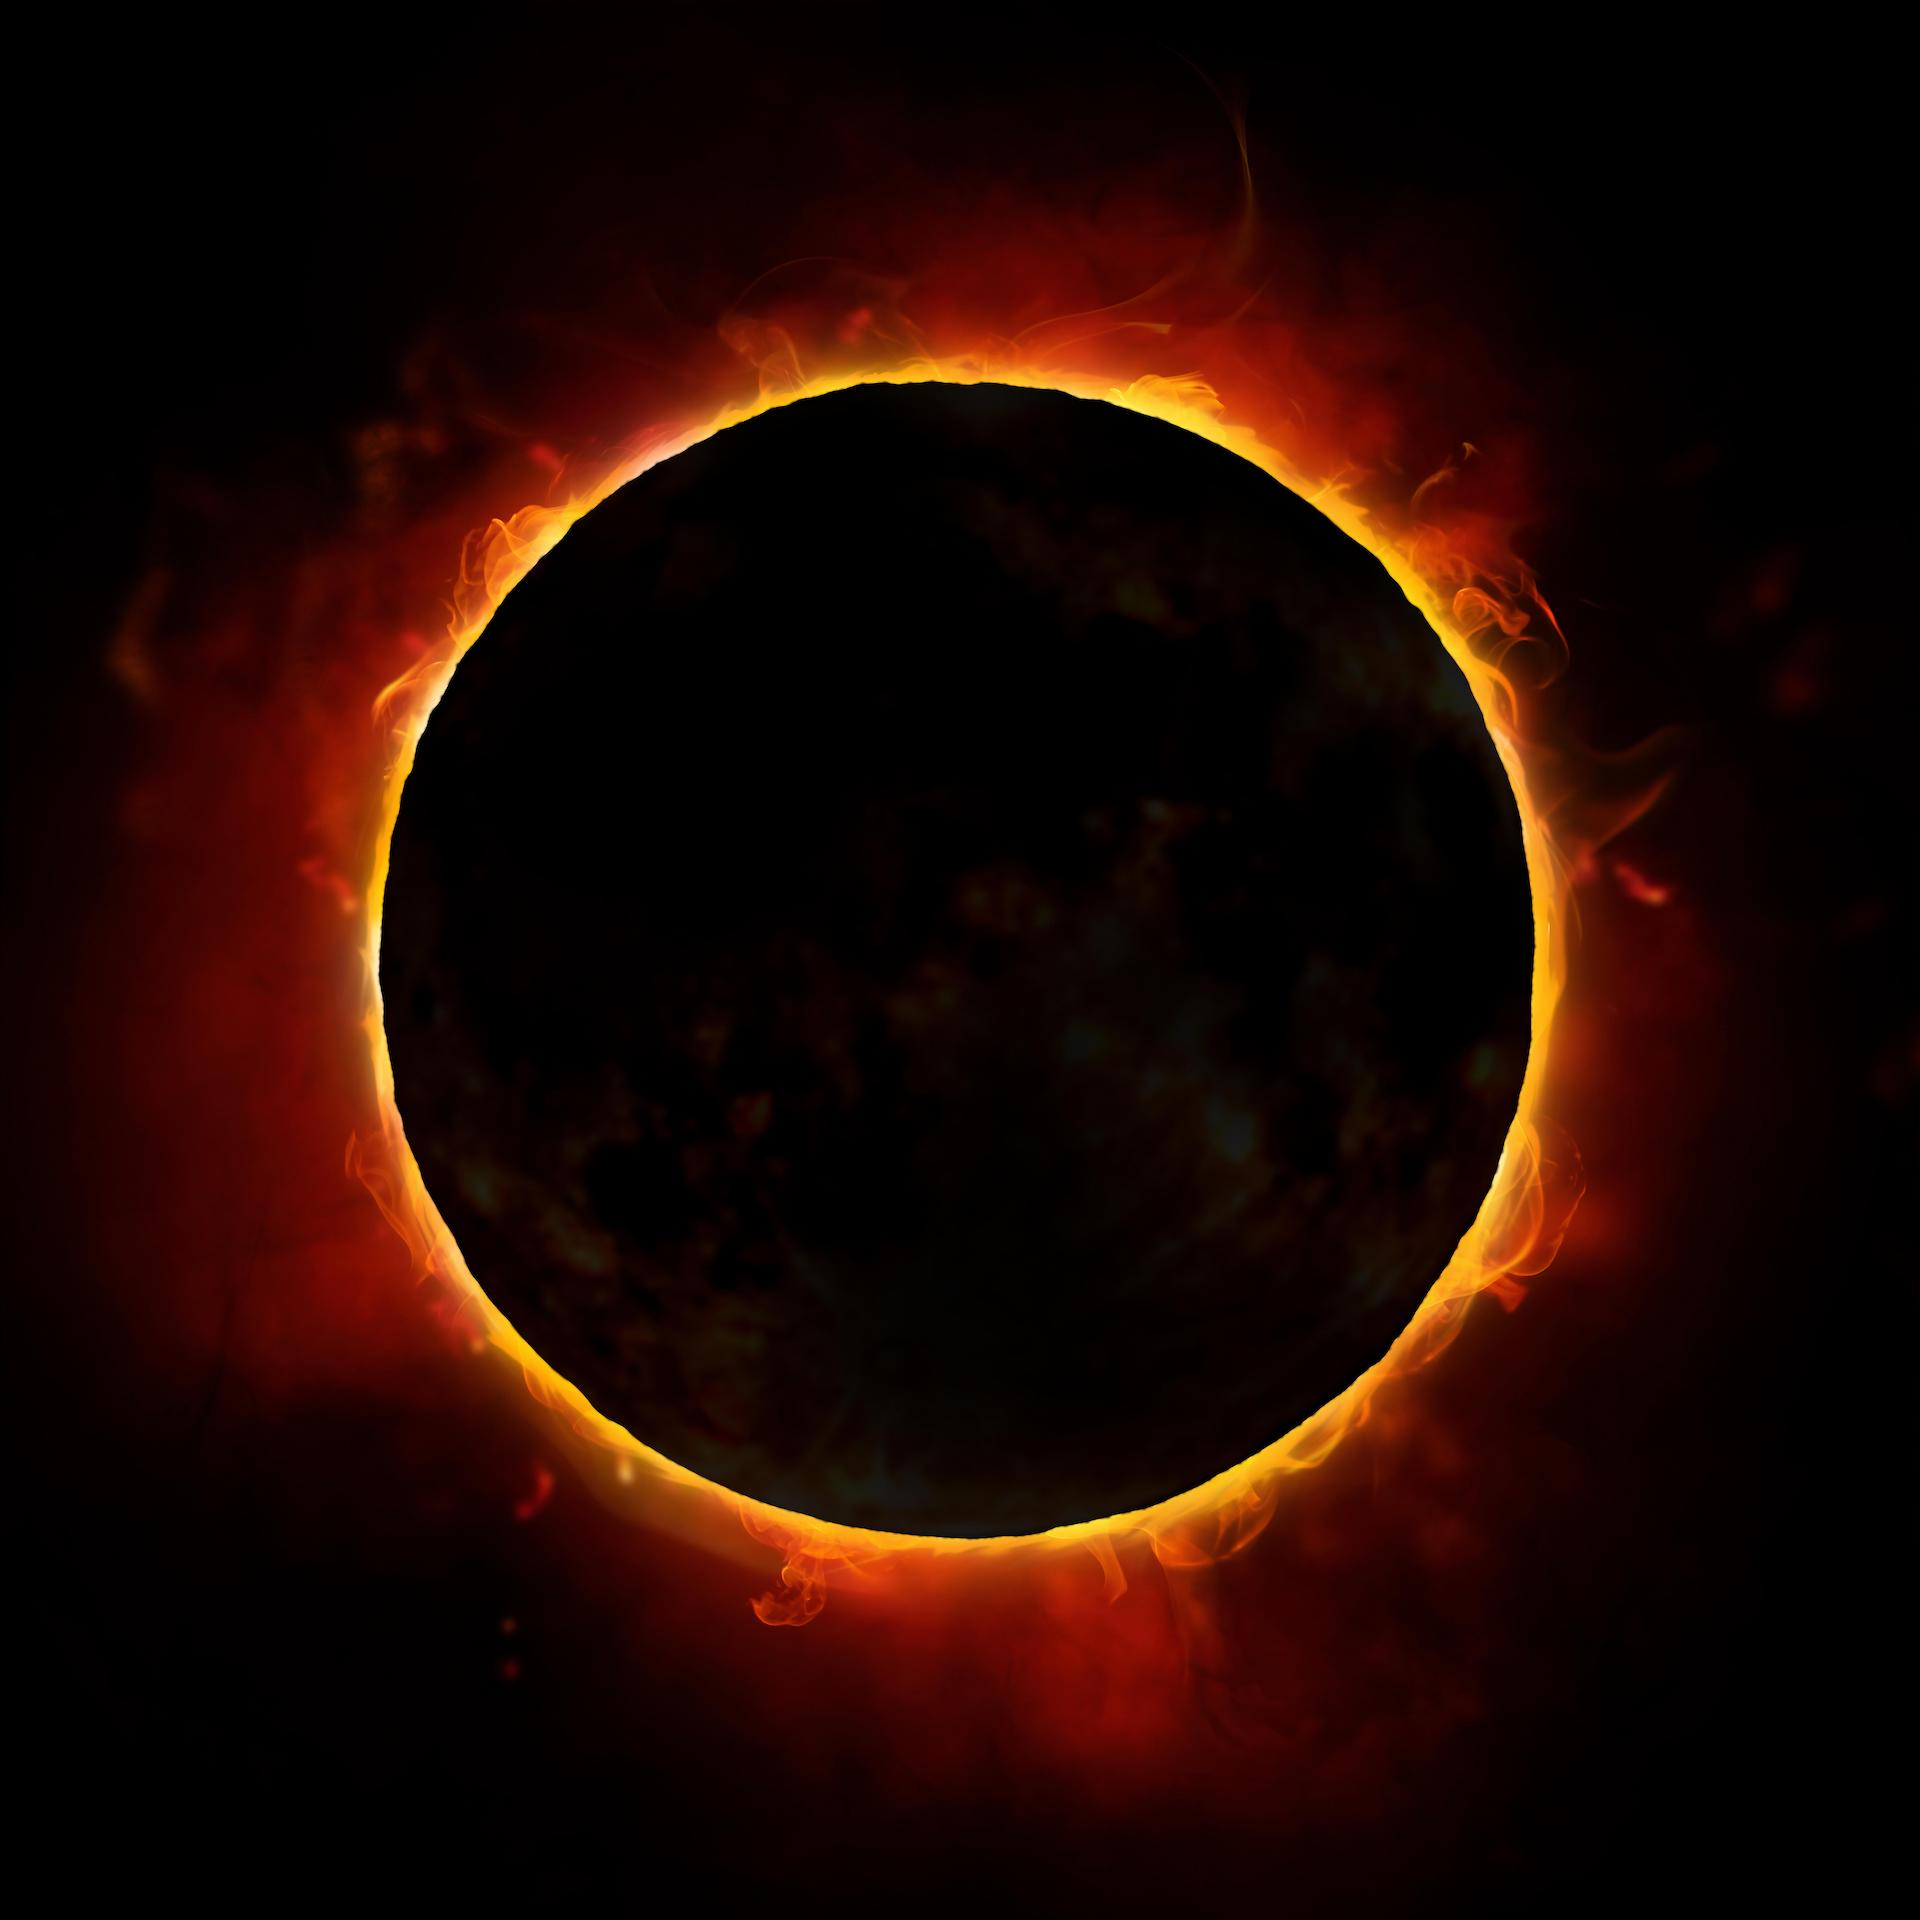 eclipse-solar23